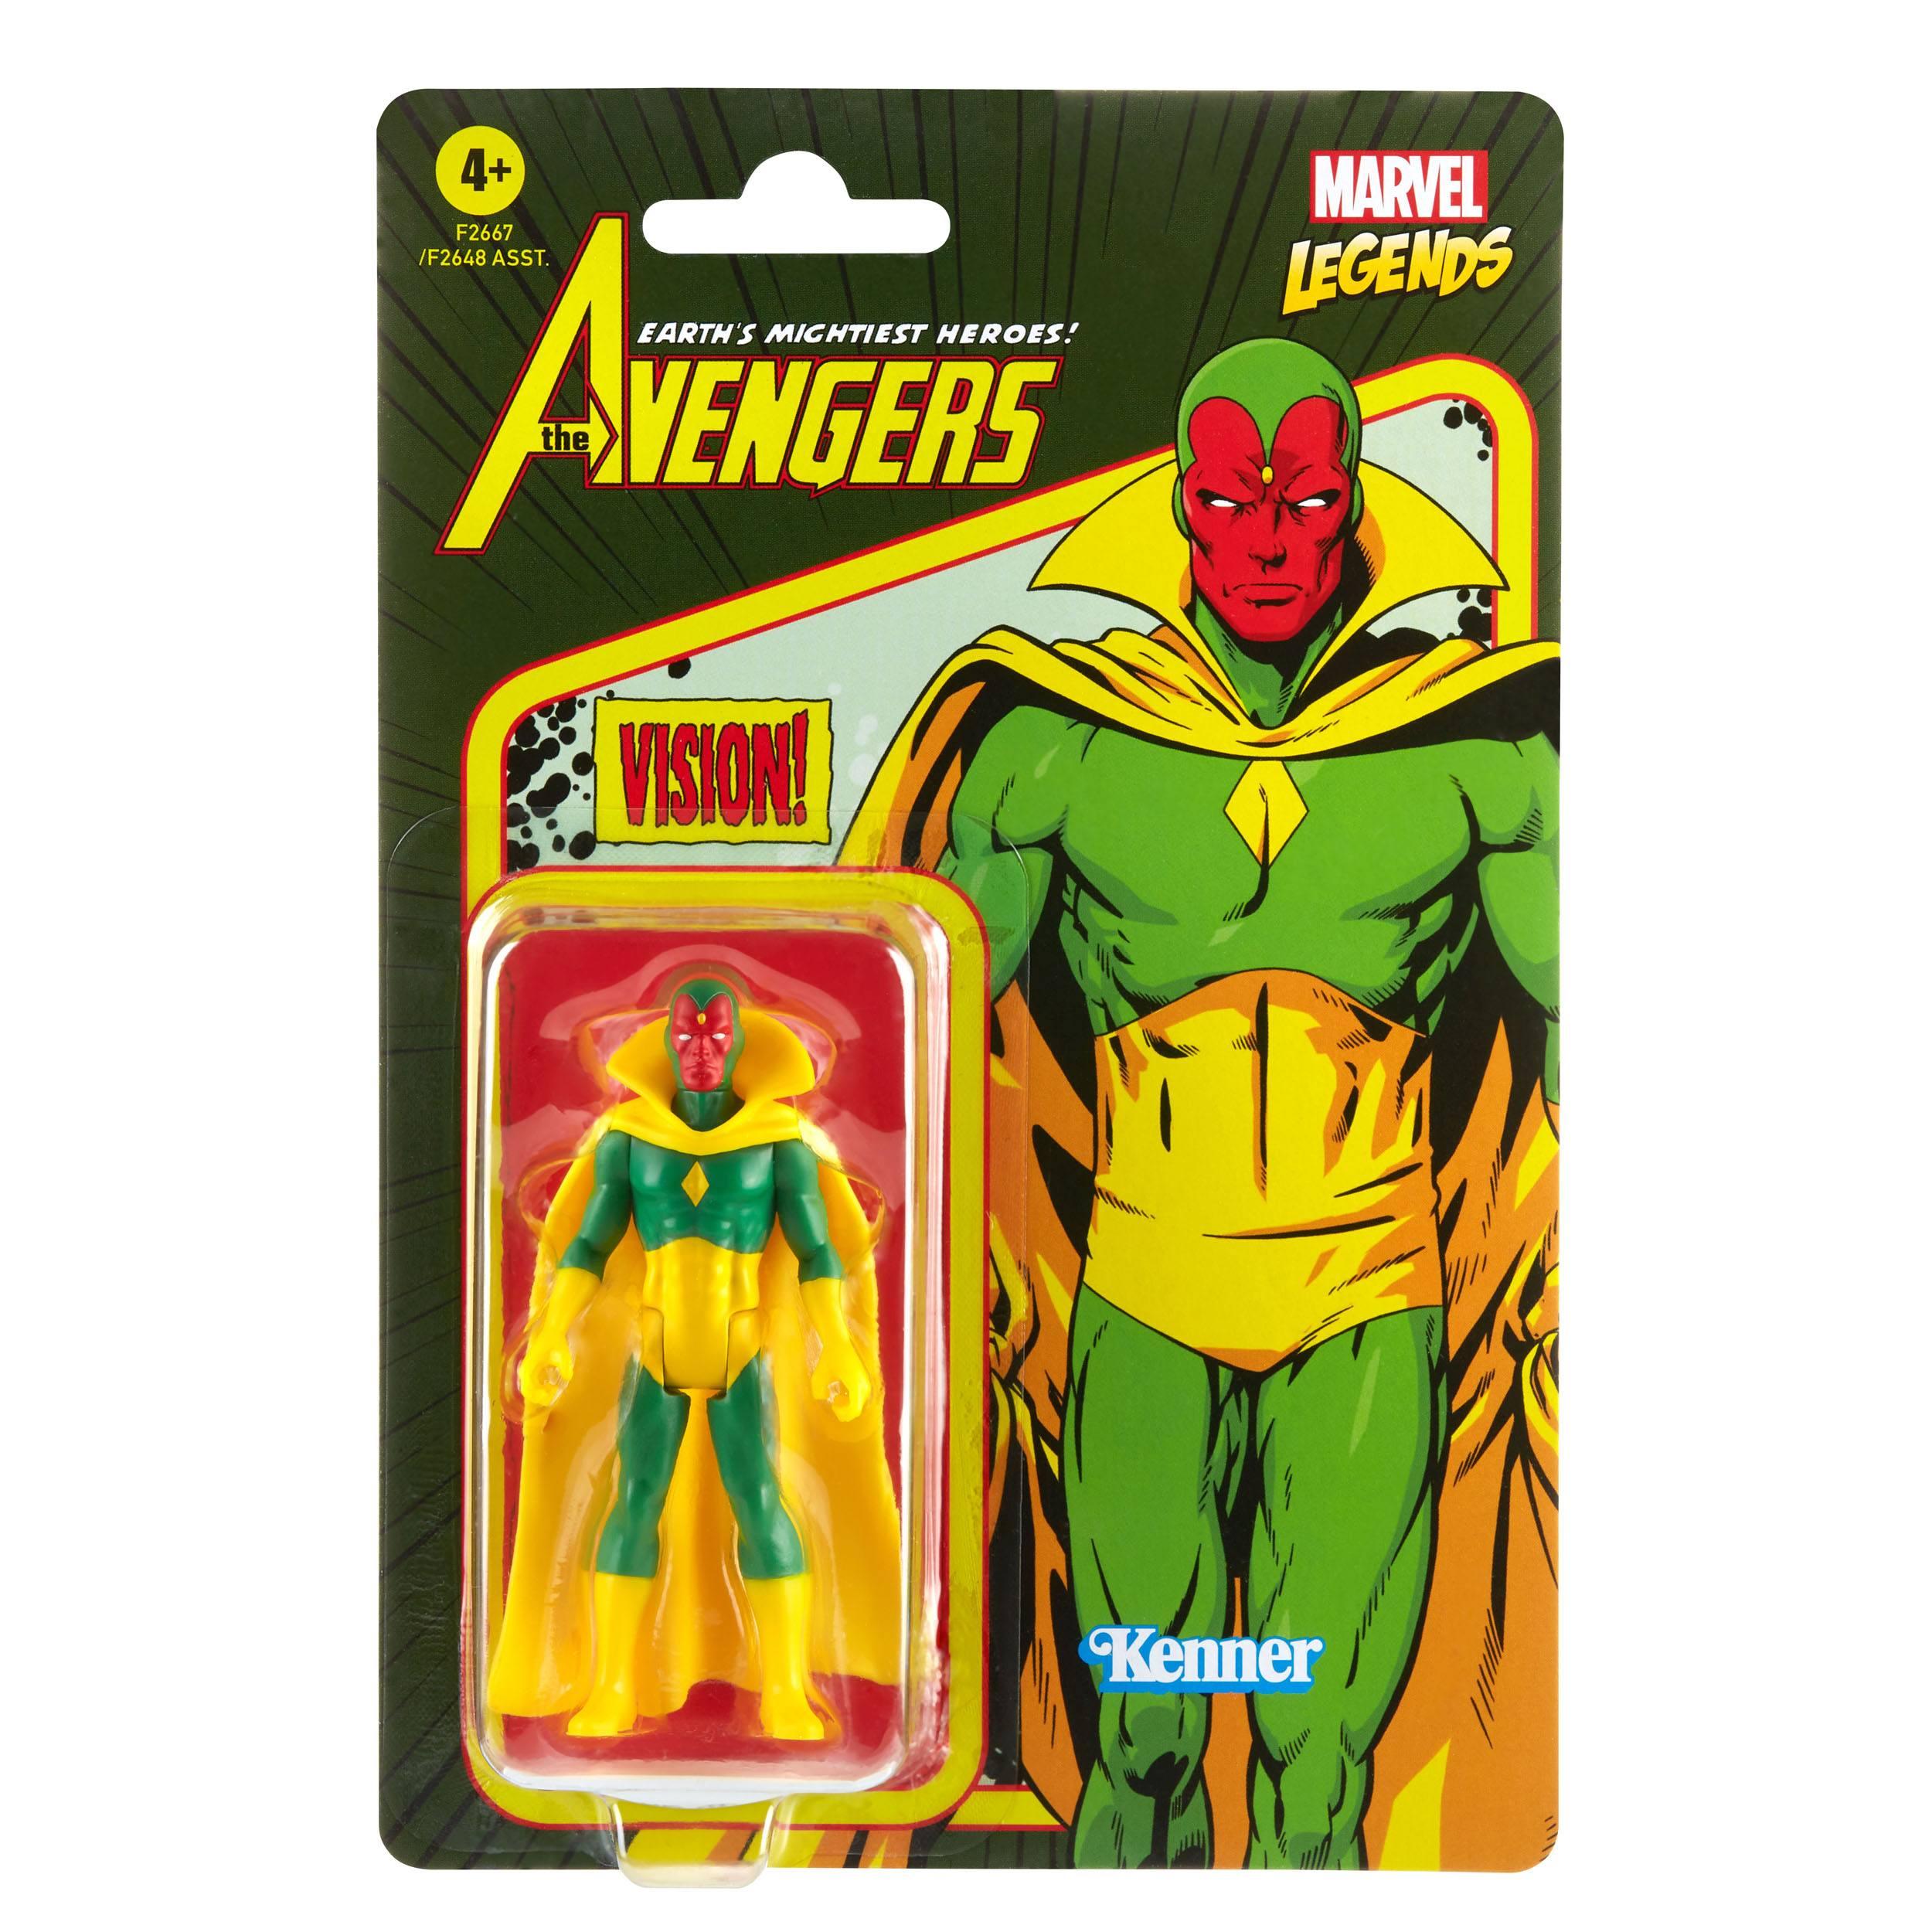 Marvel Legends Retro 375 Collection Assortment (7) Wave 3 F26485L02 5010993842766